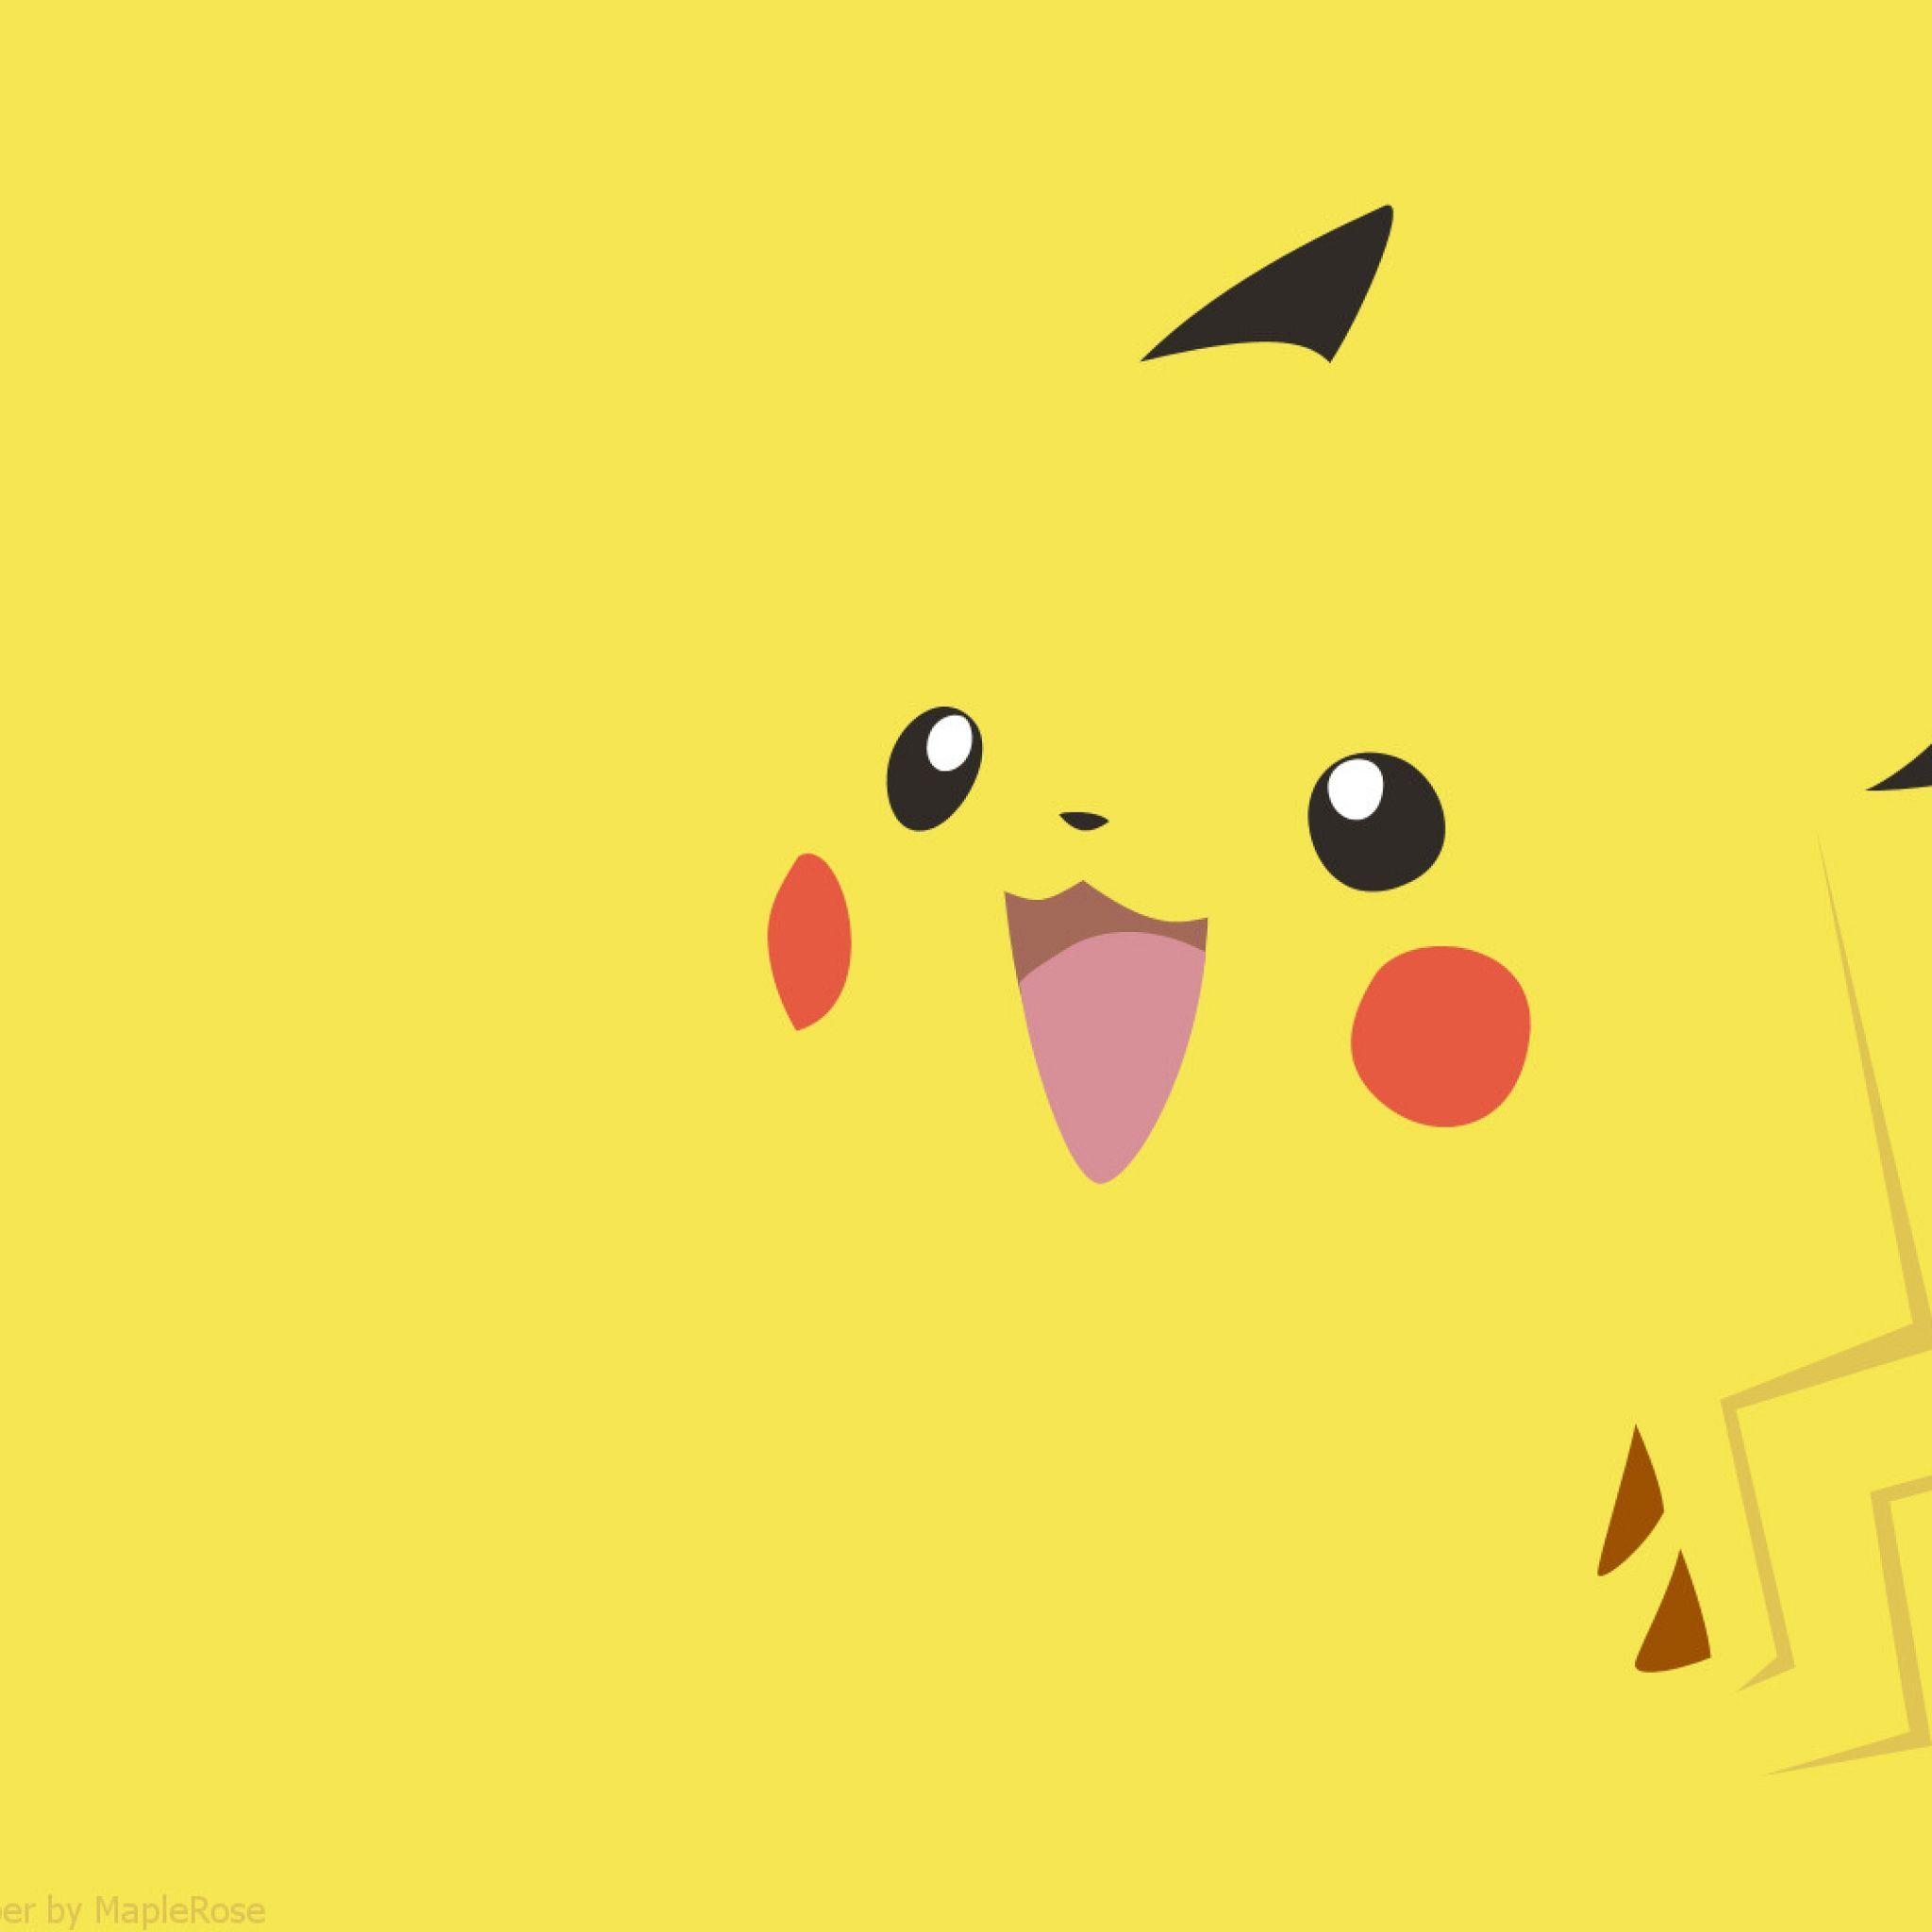 Pokemon Wallpaper Ipad Pikachu 15398 Wallpaper qsht168